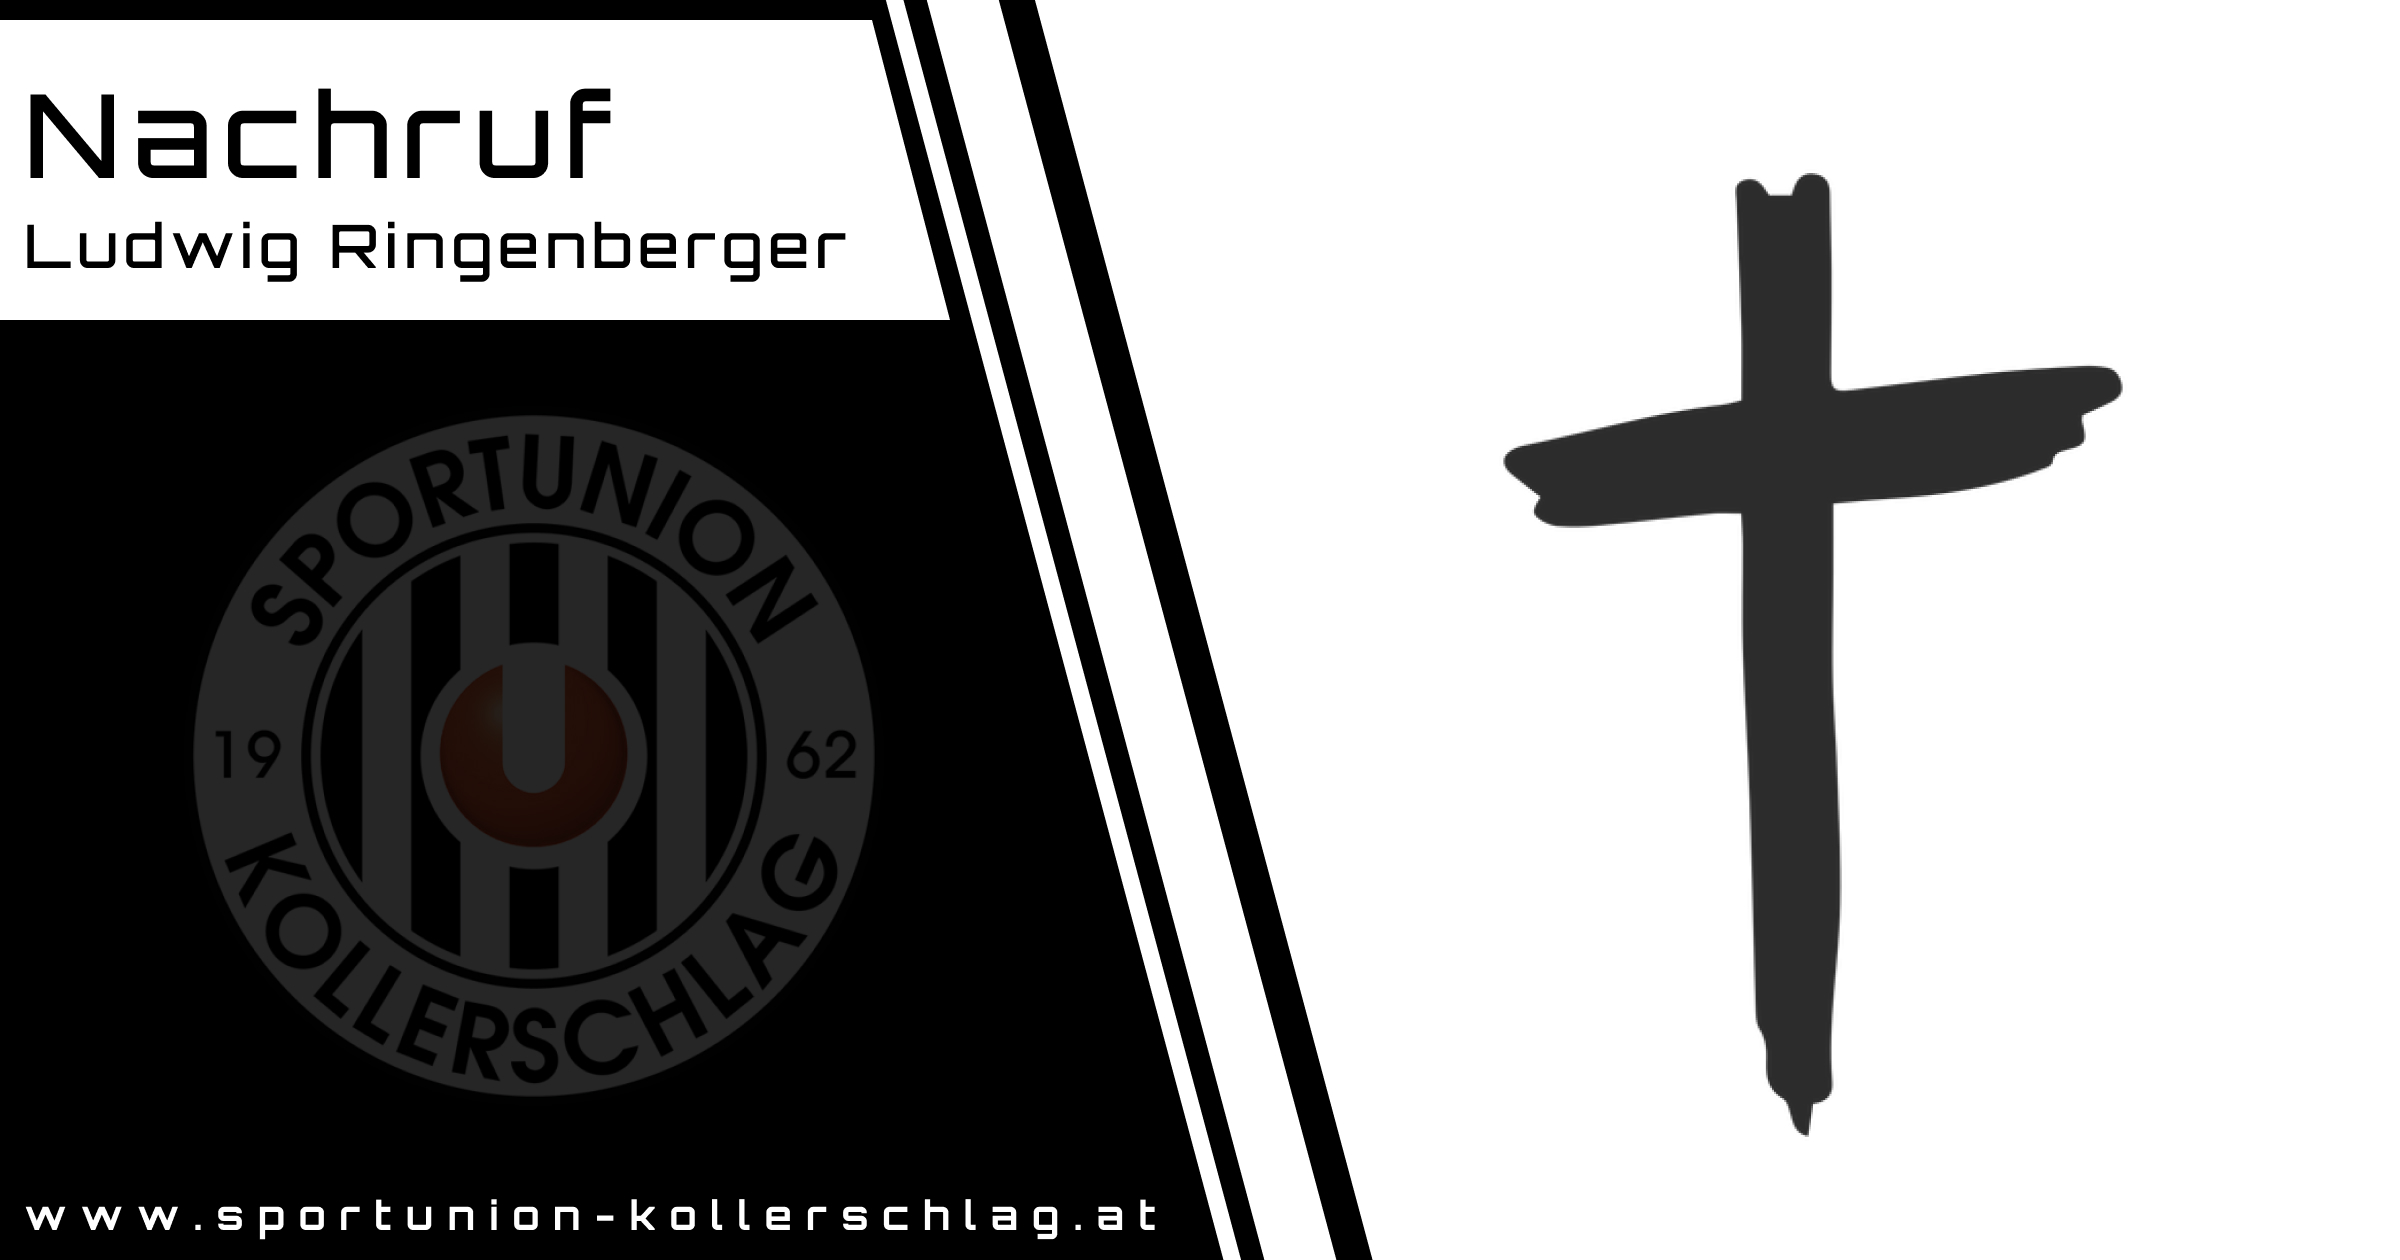 Gründungsobmann Ludwig Ringenberger verstorben